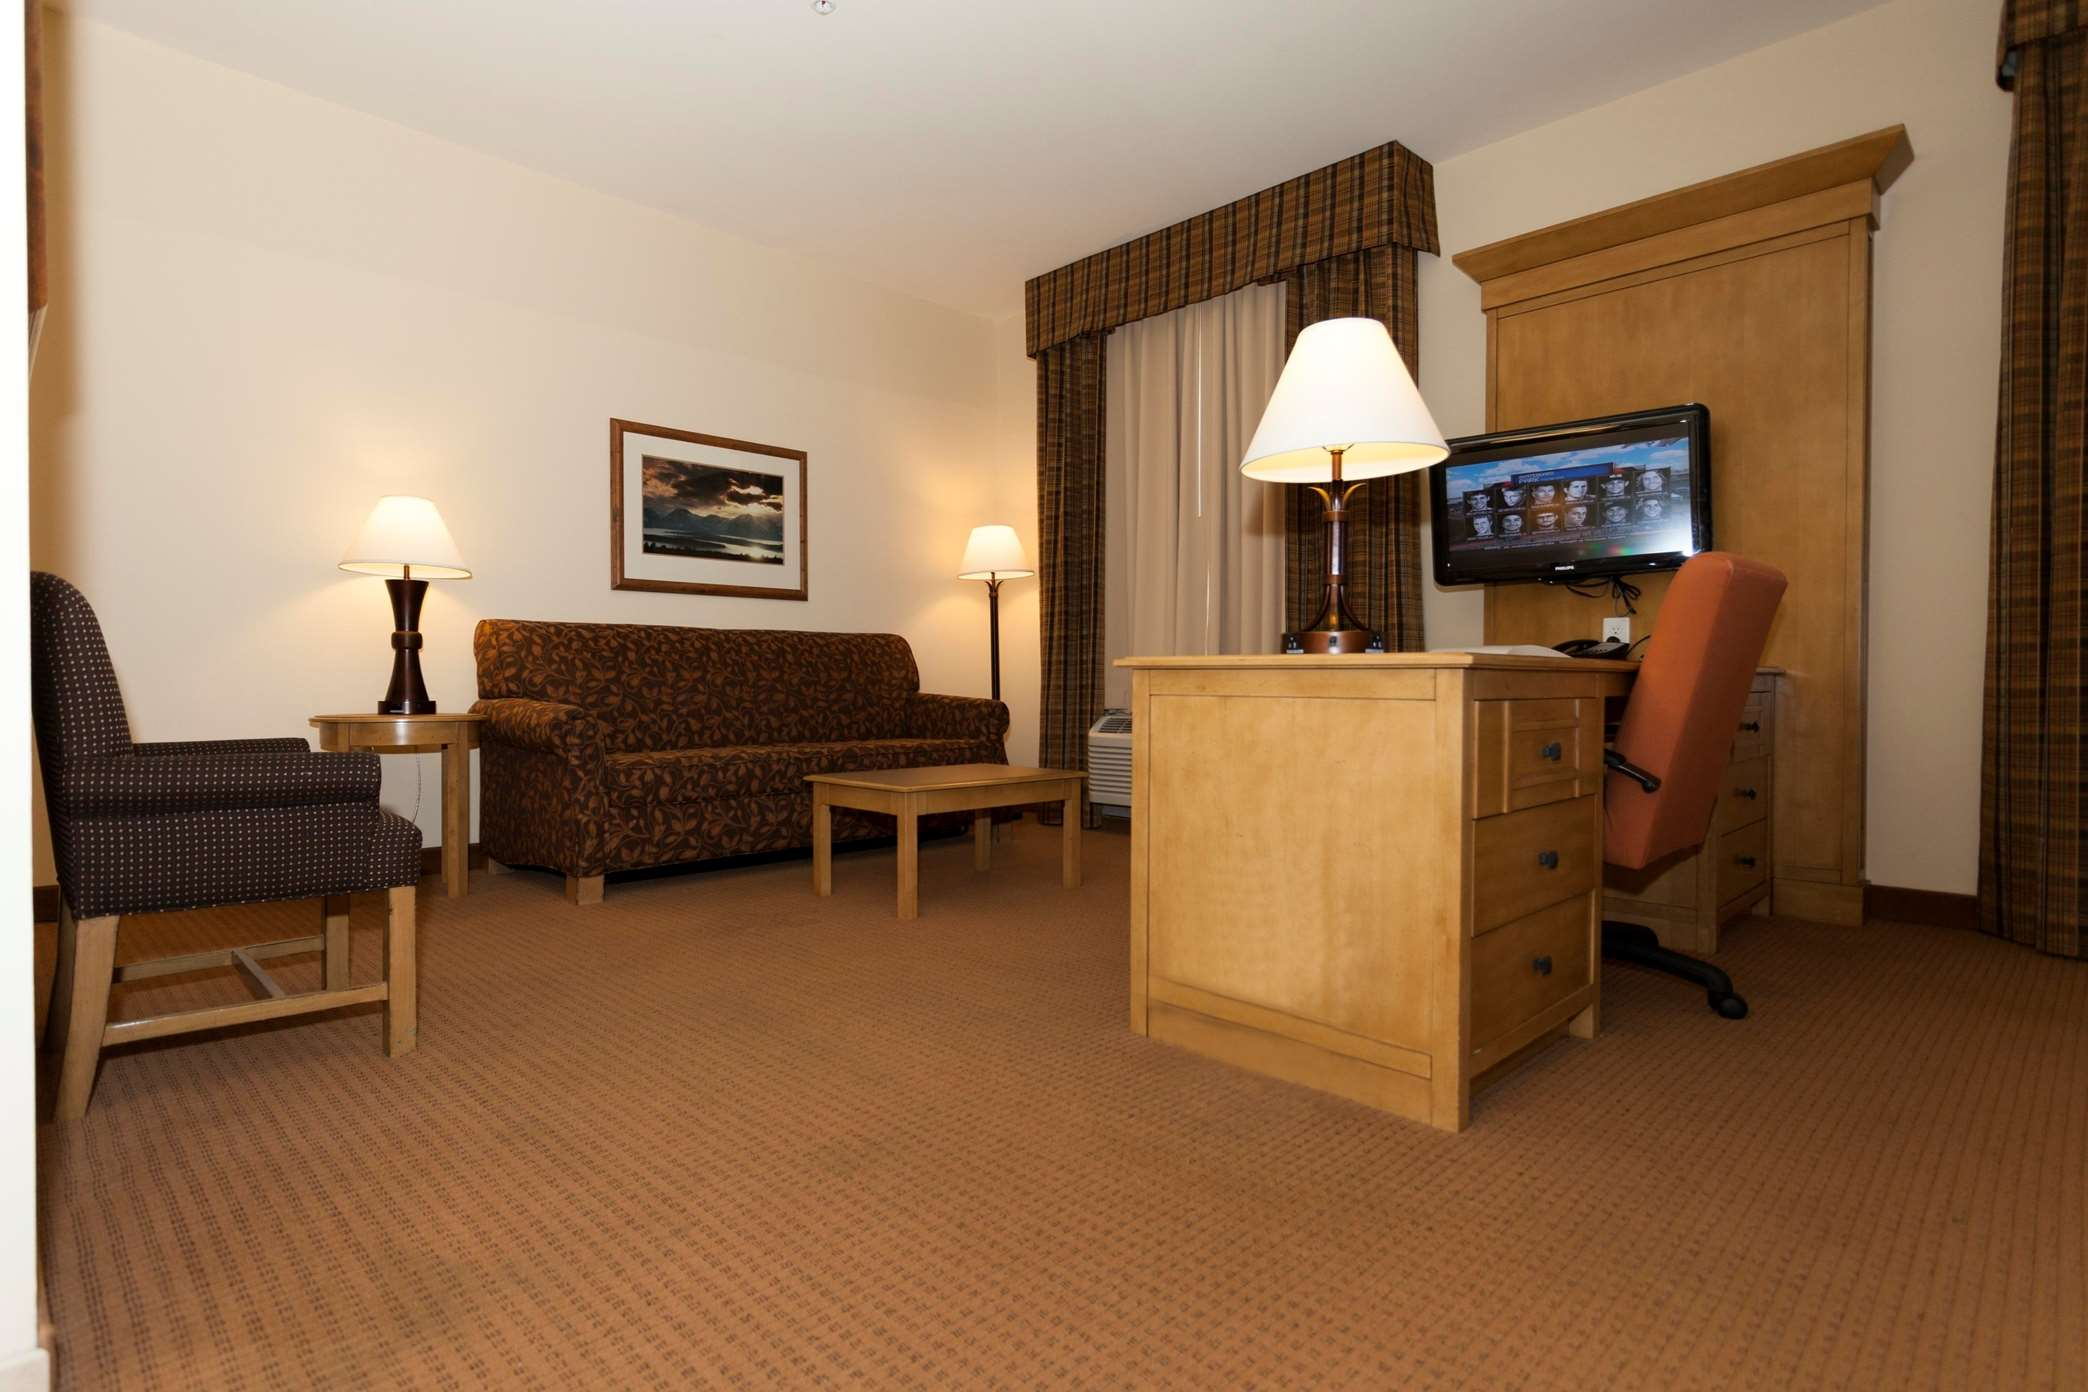 Hampton Inn & Suites Riverton image 20